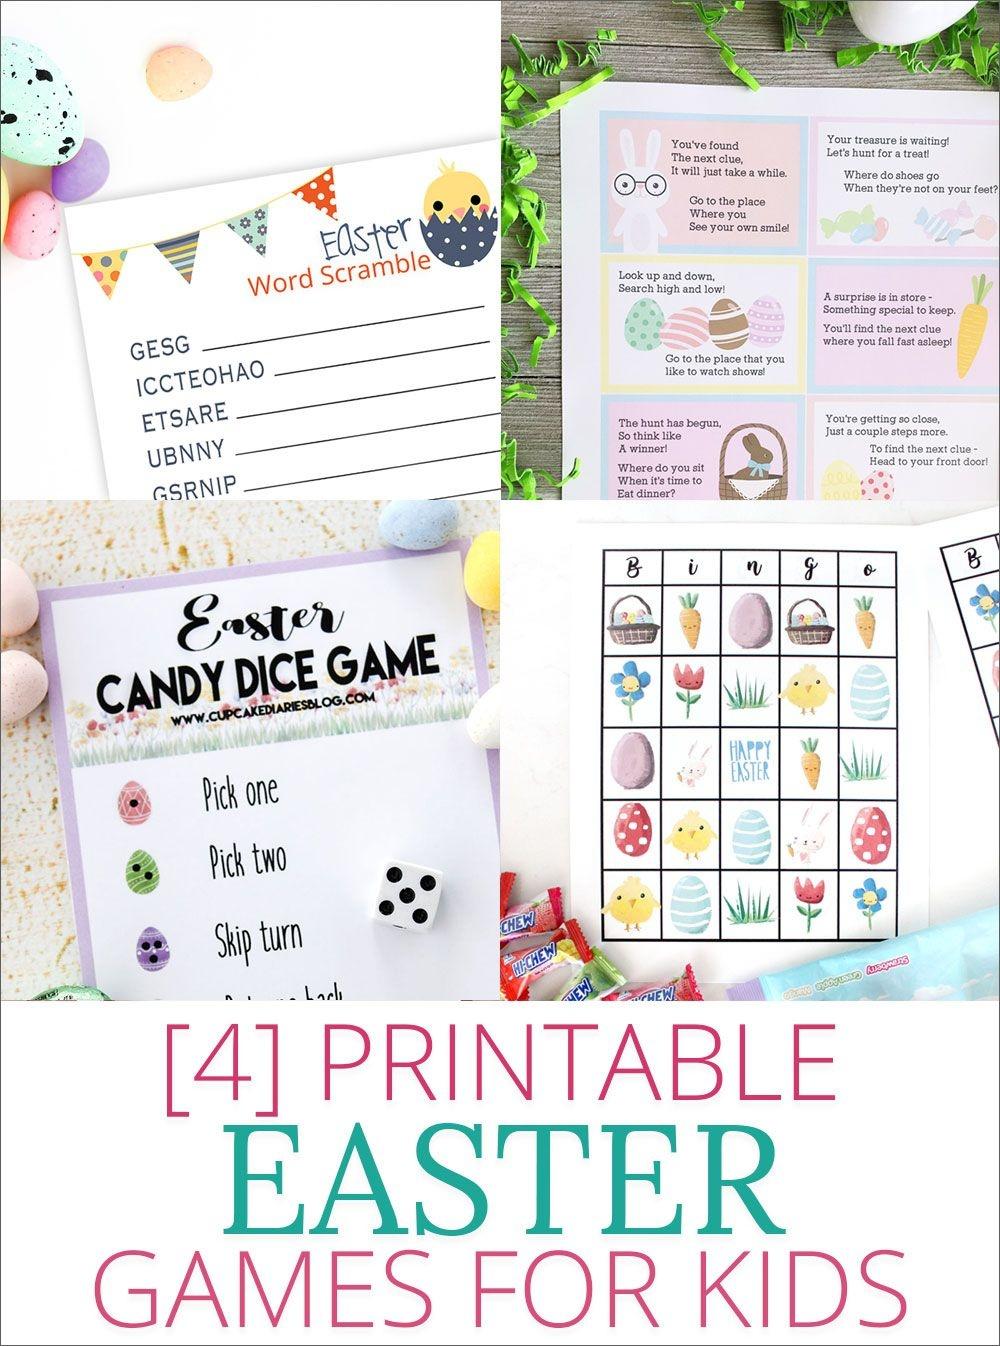 Free Printable Easter Bingo | For The Grandkiddies | Easter Games - Easter Games For Adults Printable Free